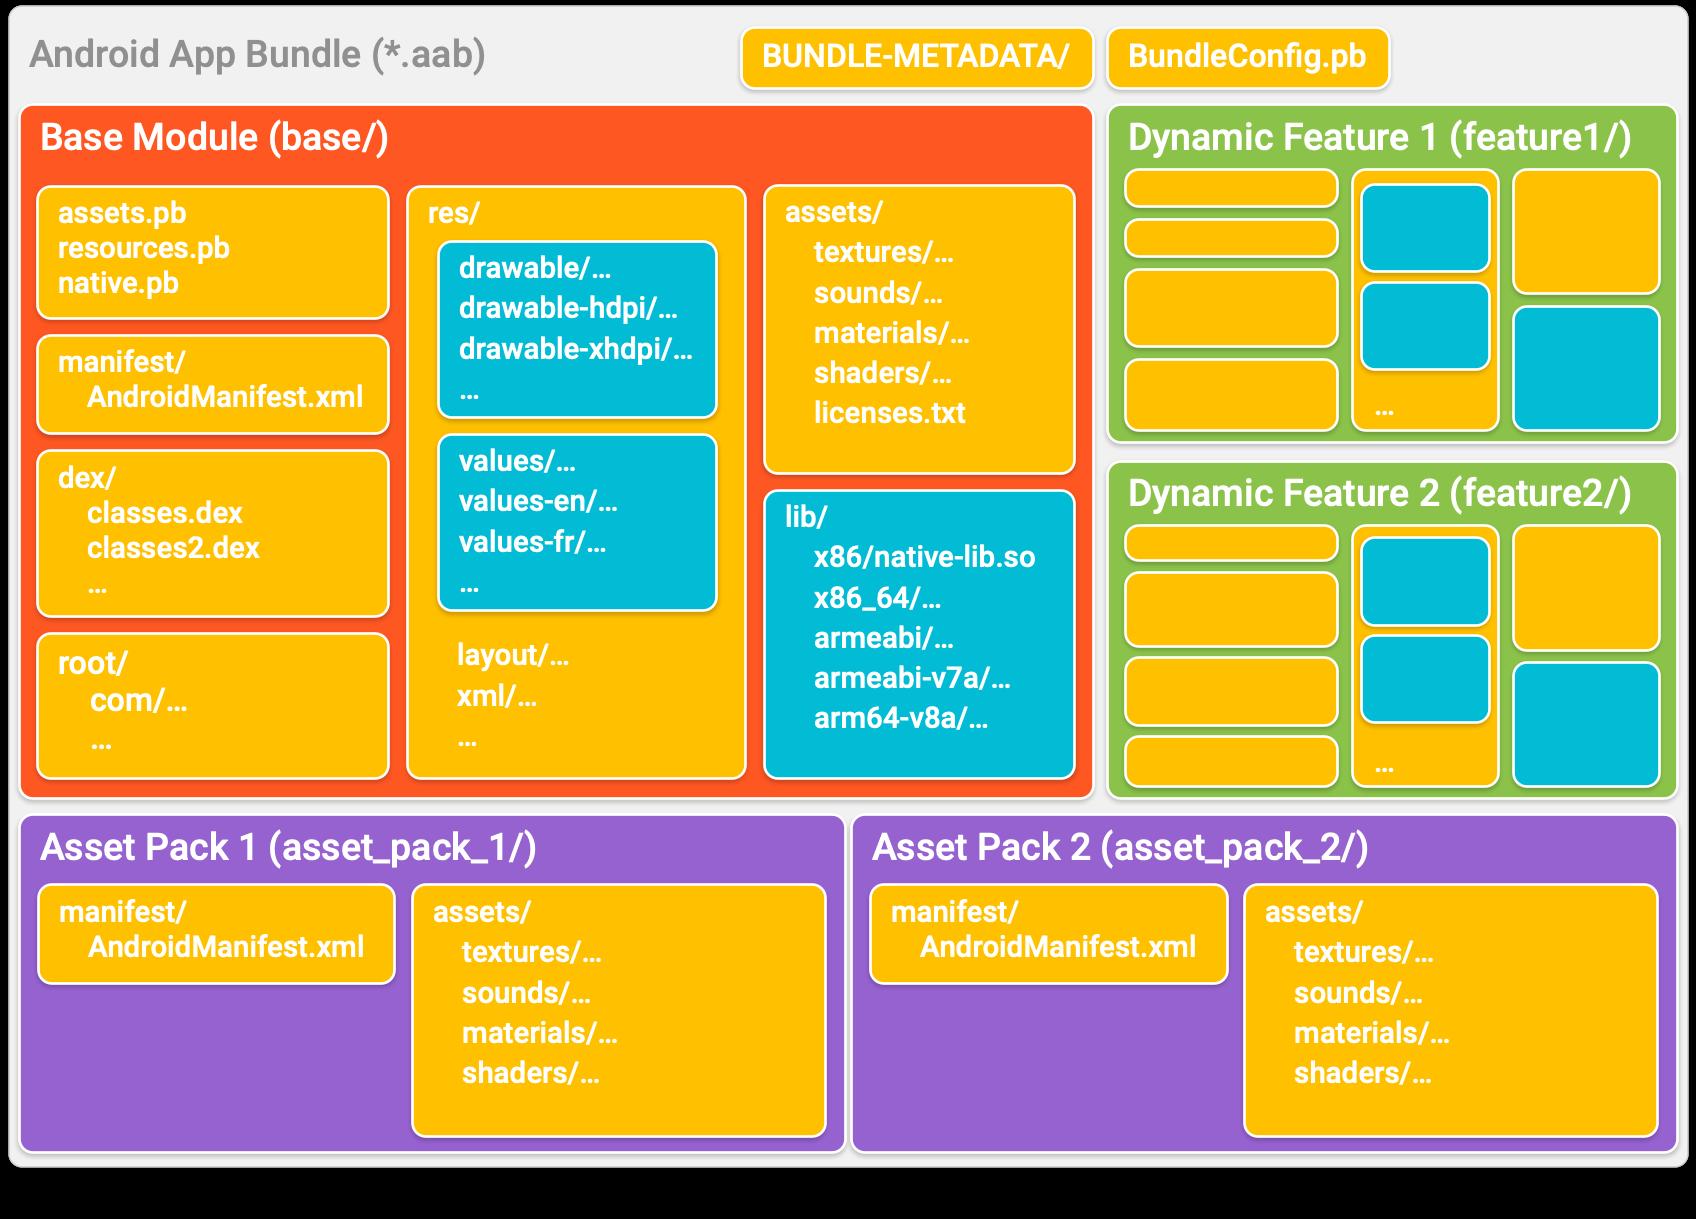 App Bundle は、それぞれがモジュールを表すディレクトリにアプリを整理します。各モジュール ディレクトリ内のコードとリソースは一般的な APK と同様に構成されています。